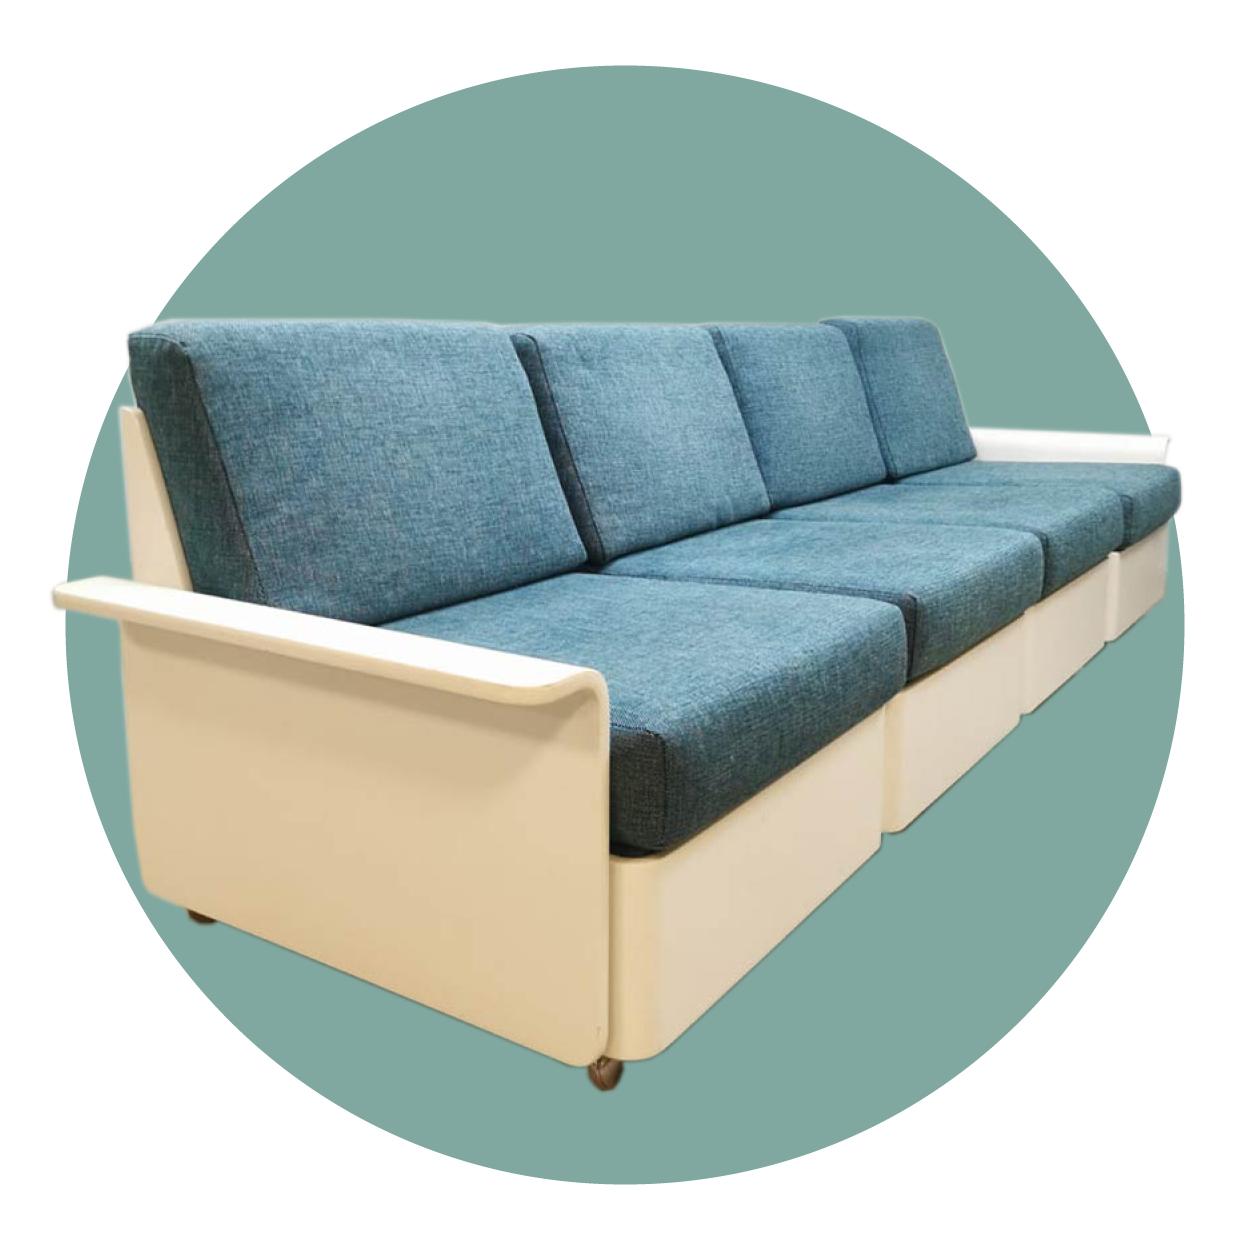 Bestwelhip easy chair